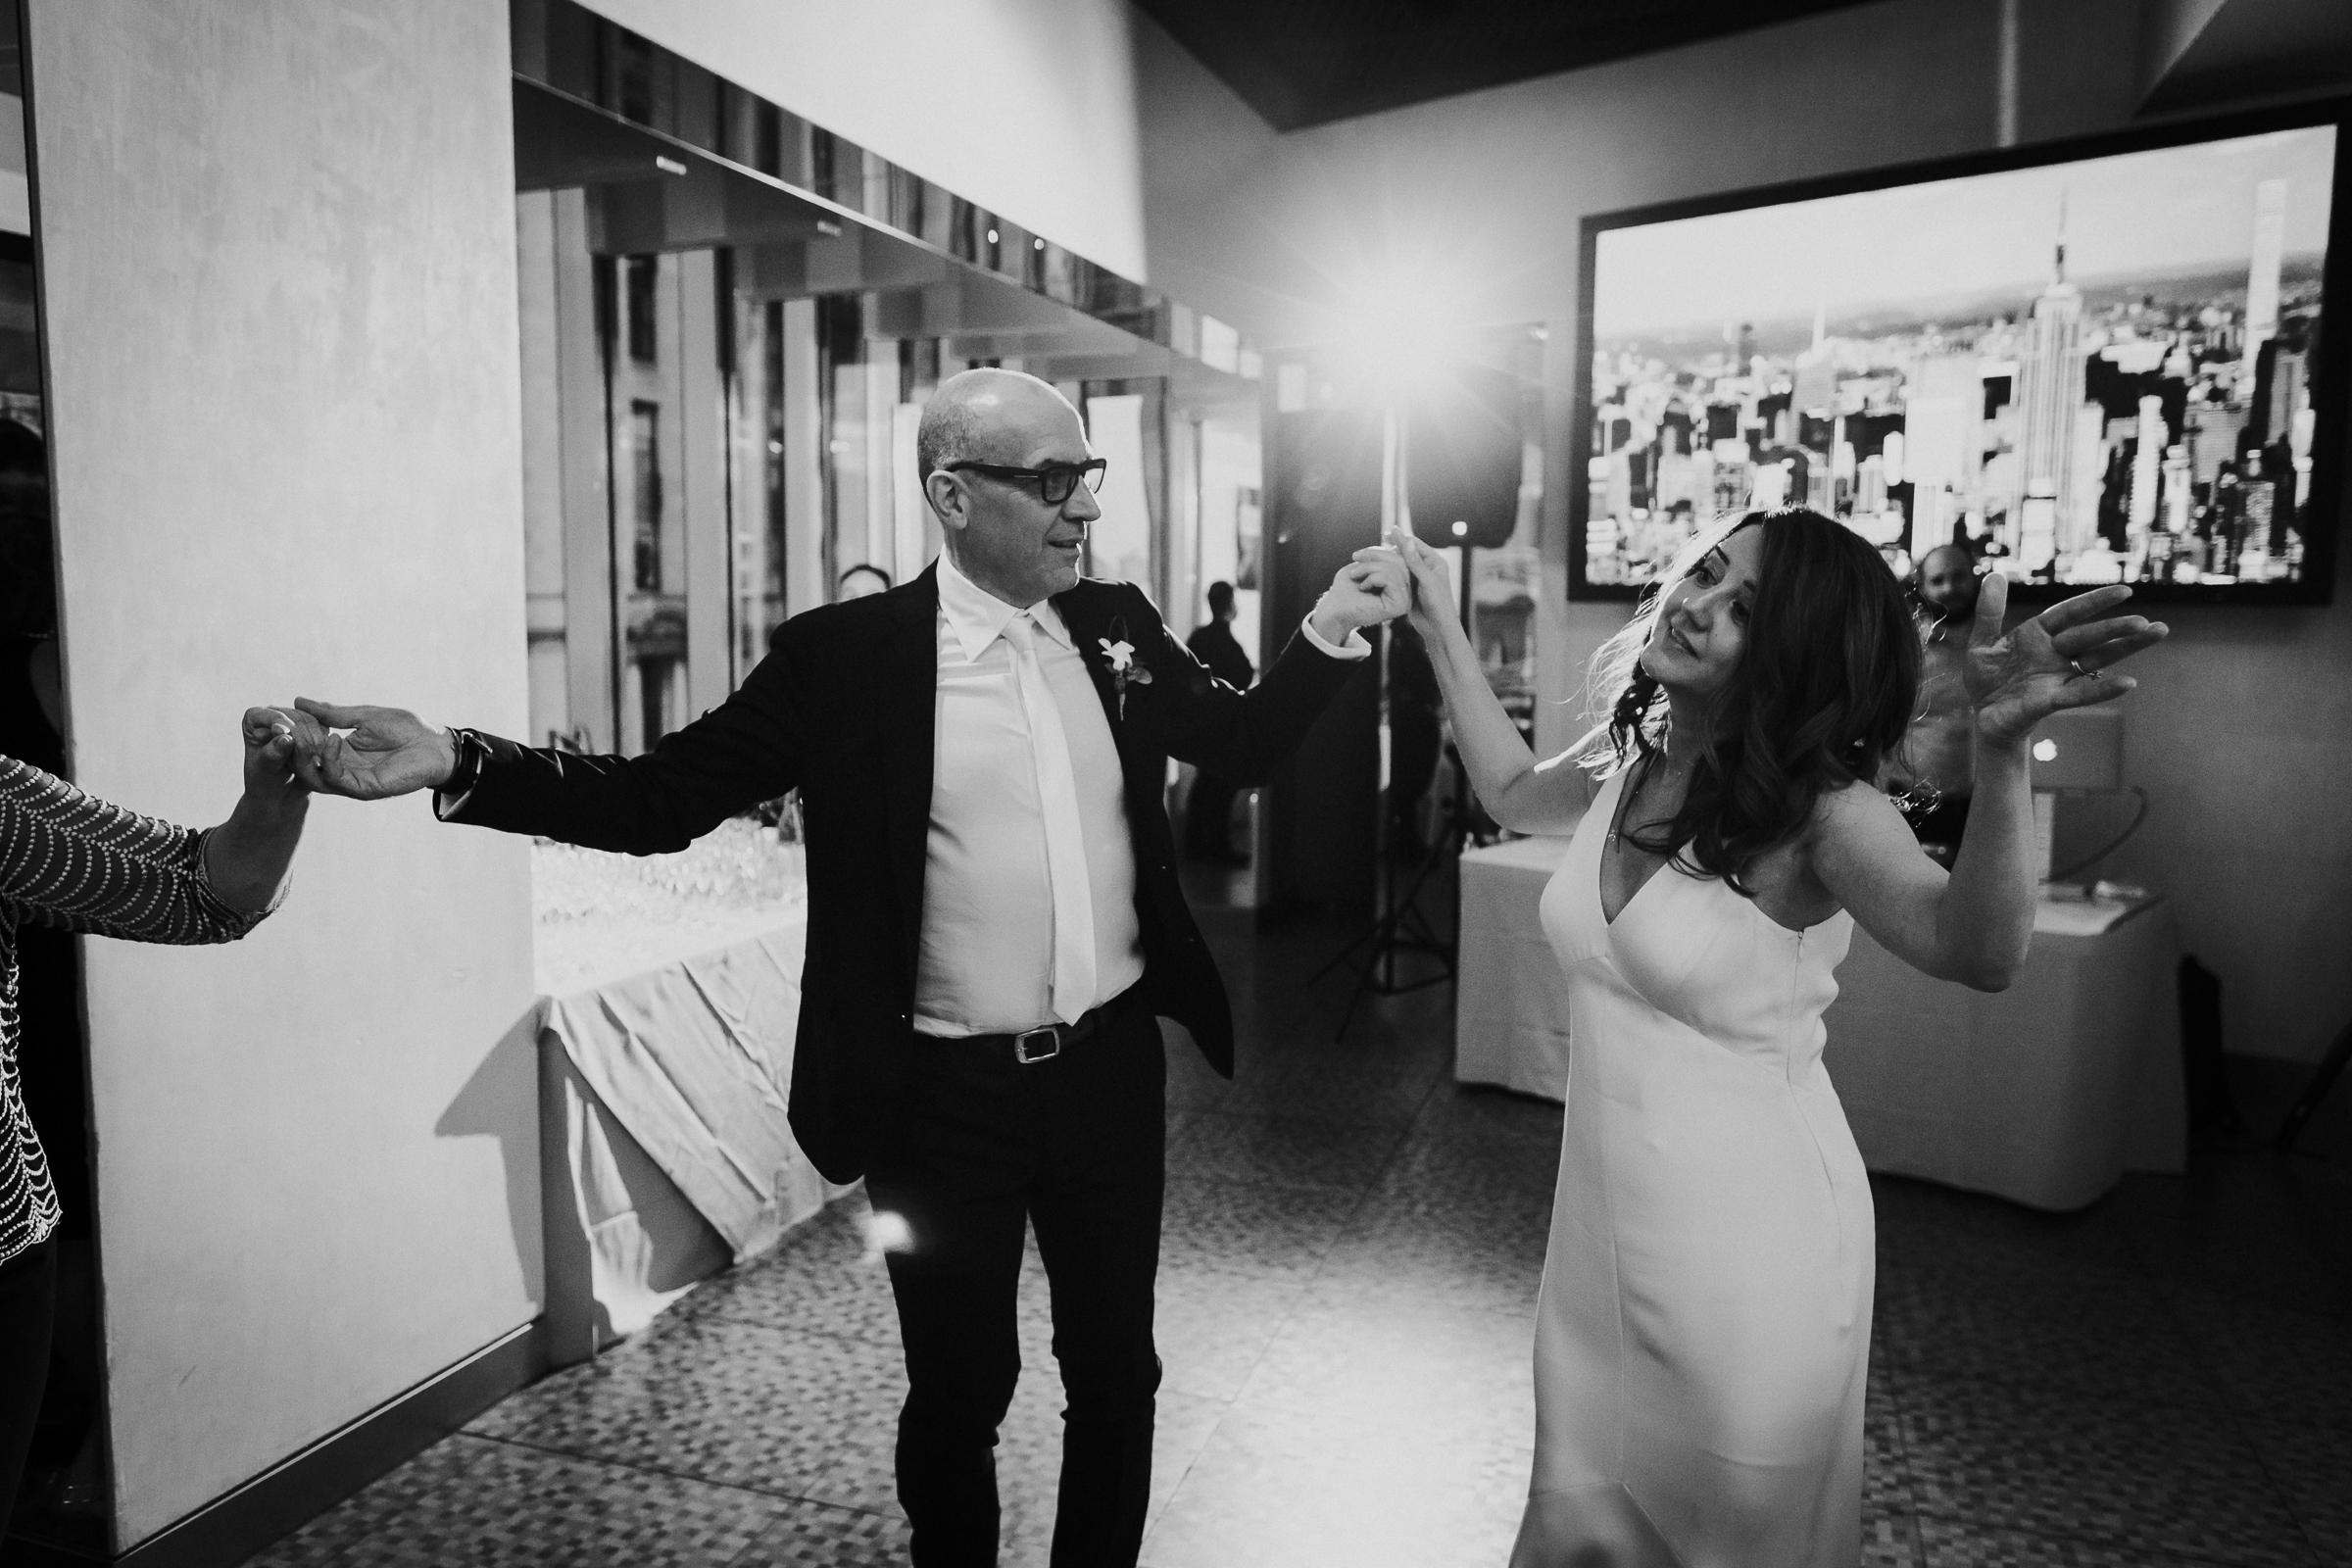 Robert-NYC-Museum-Of-Arts-&-Design-Greek-Italian-New-York-Documentary-Wedding-Photographer-74.jpg